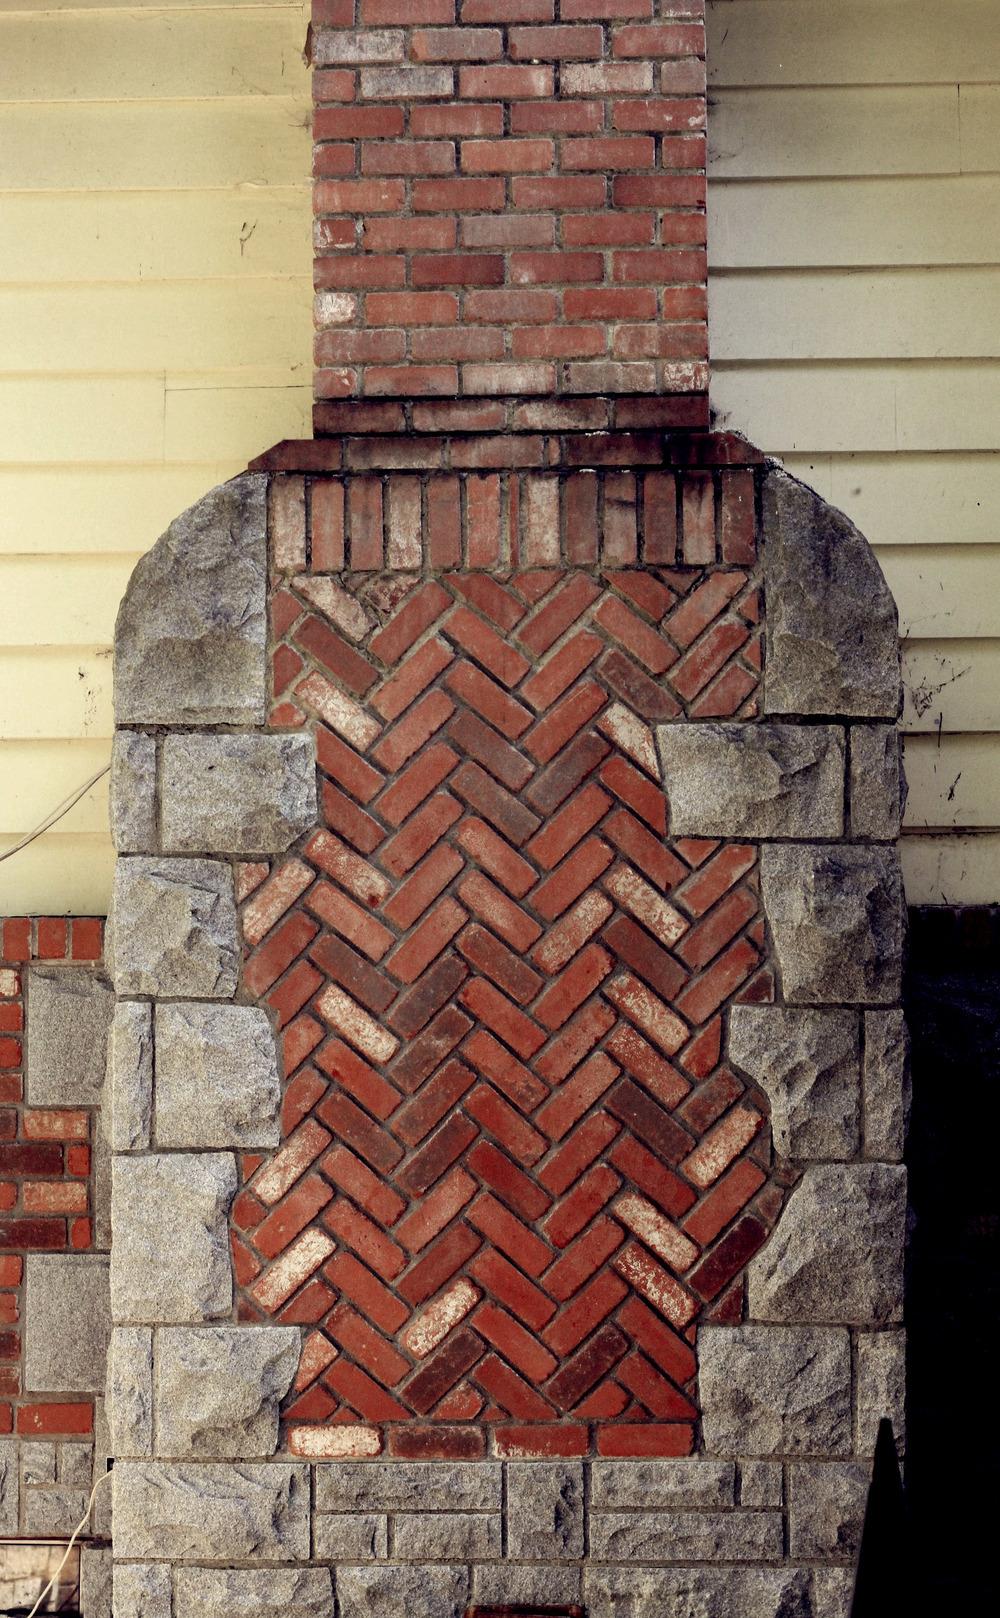 Brick_10.jpg